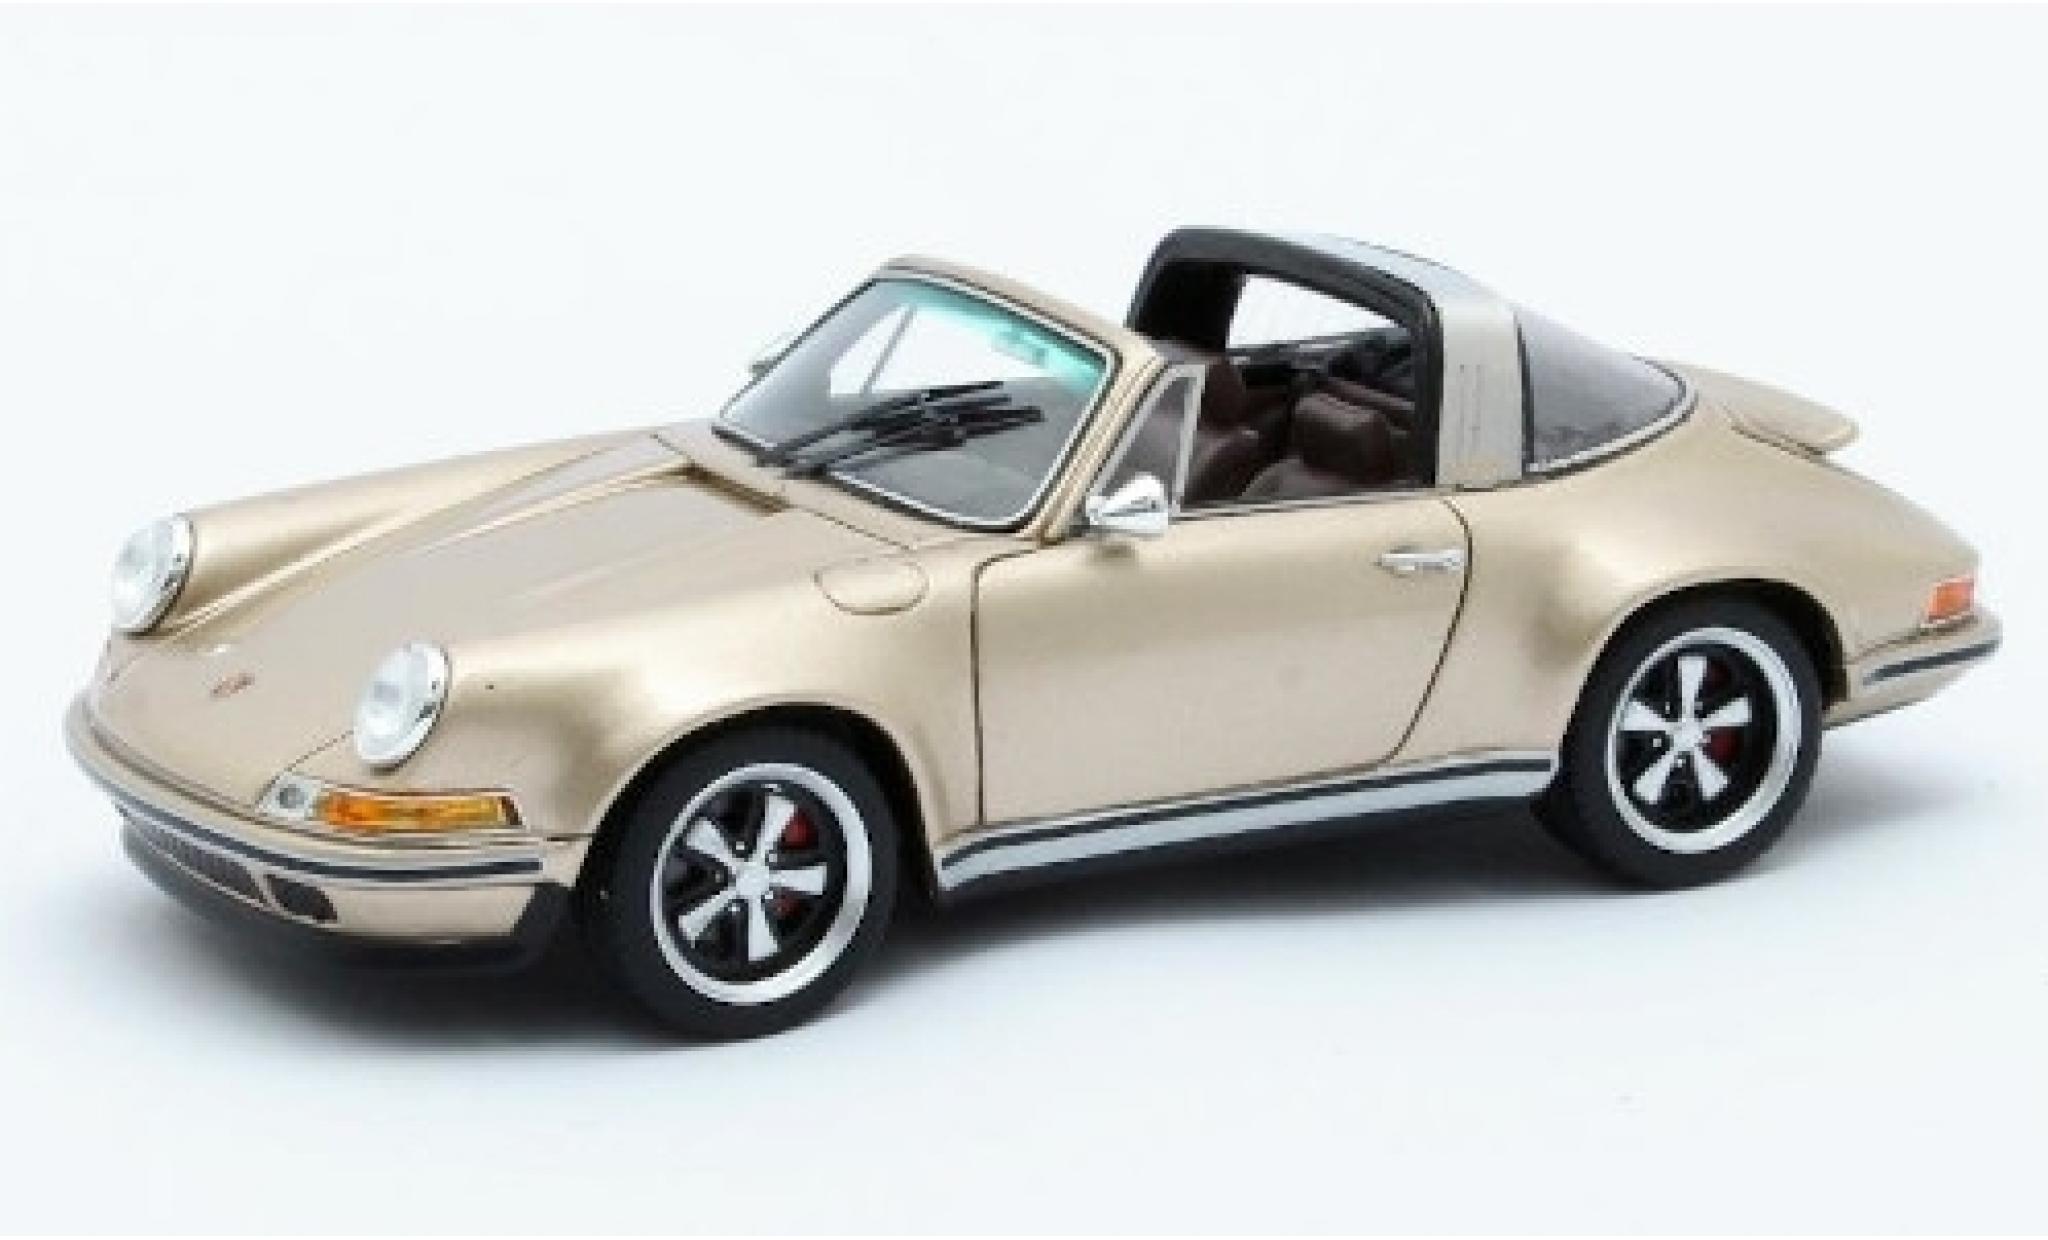 Porsche 911 1/43 Matrix Targa Singer Design gold